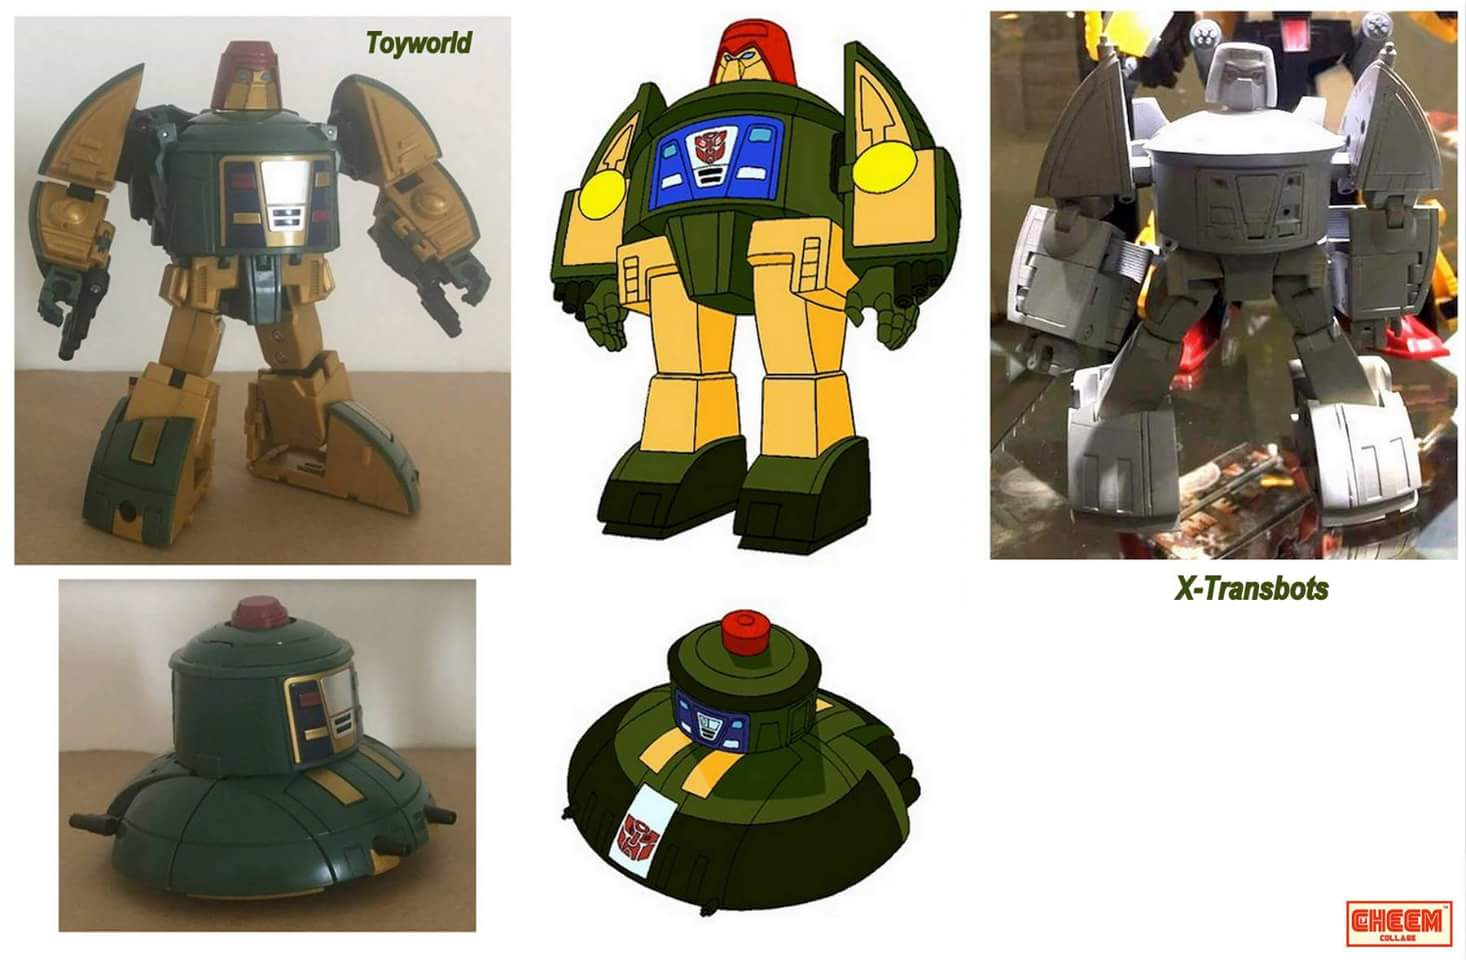 [X-Transbots] Produit Tiers - Minibots MP - Gamme MM - Page 9 YXKAIldL